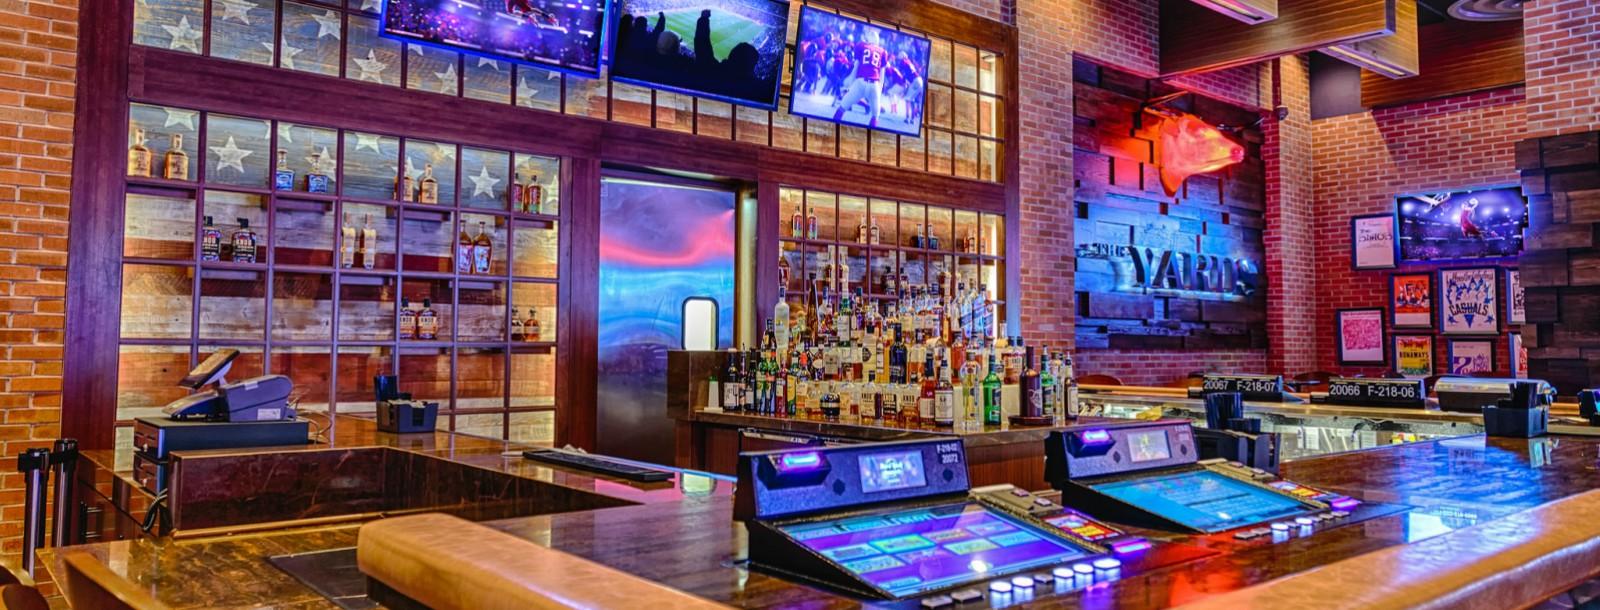 yards bar sioux city iowa